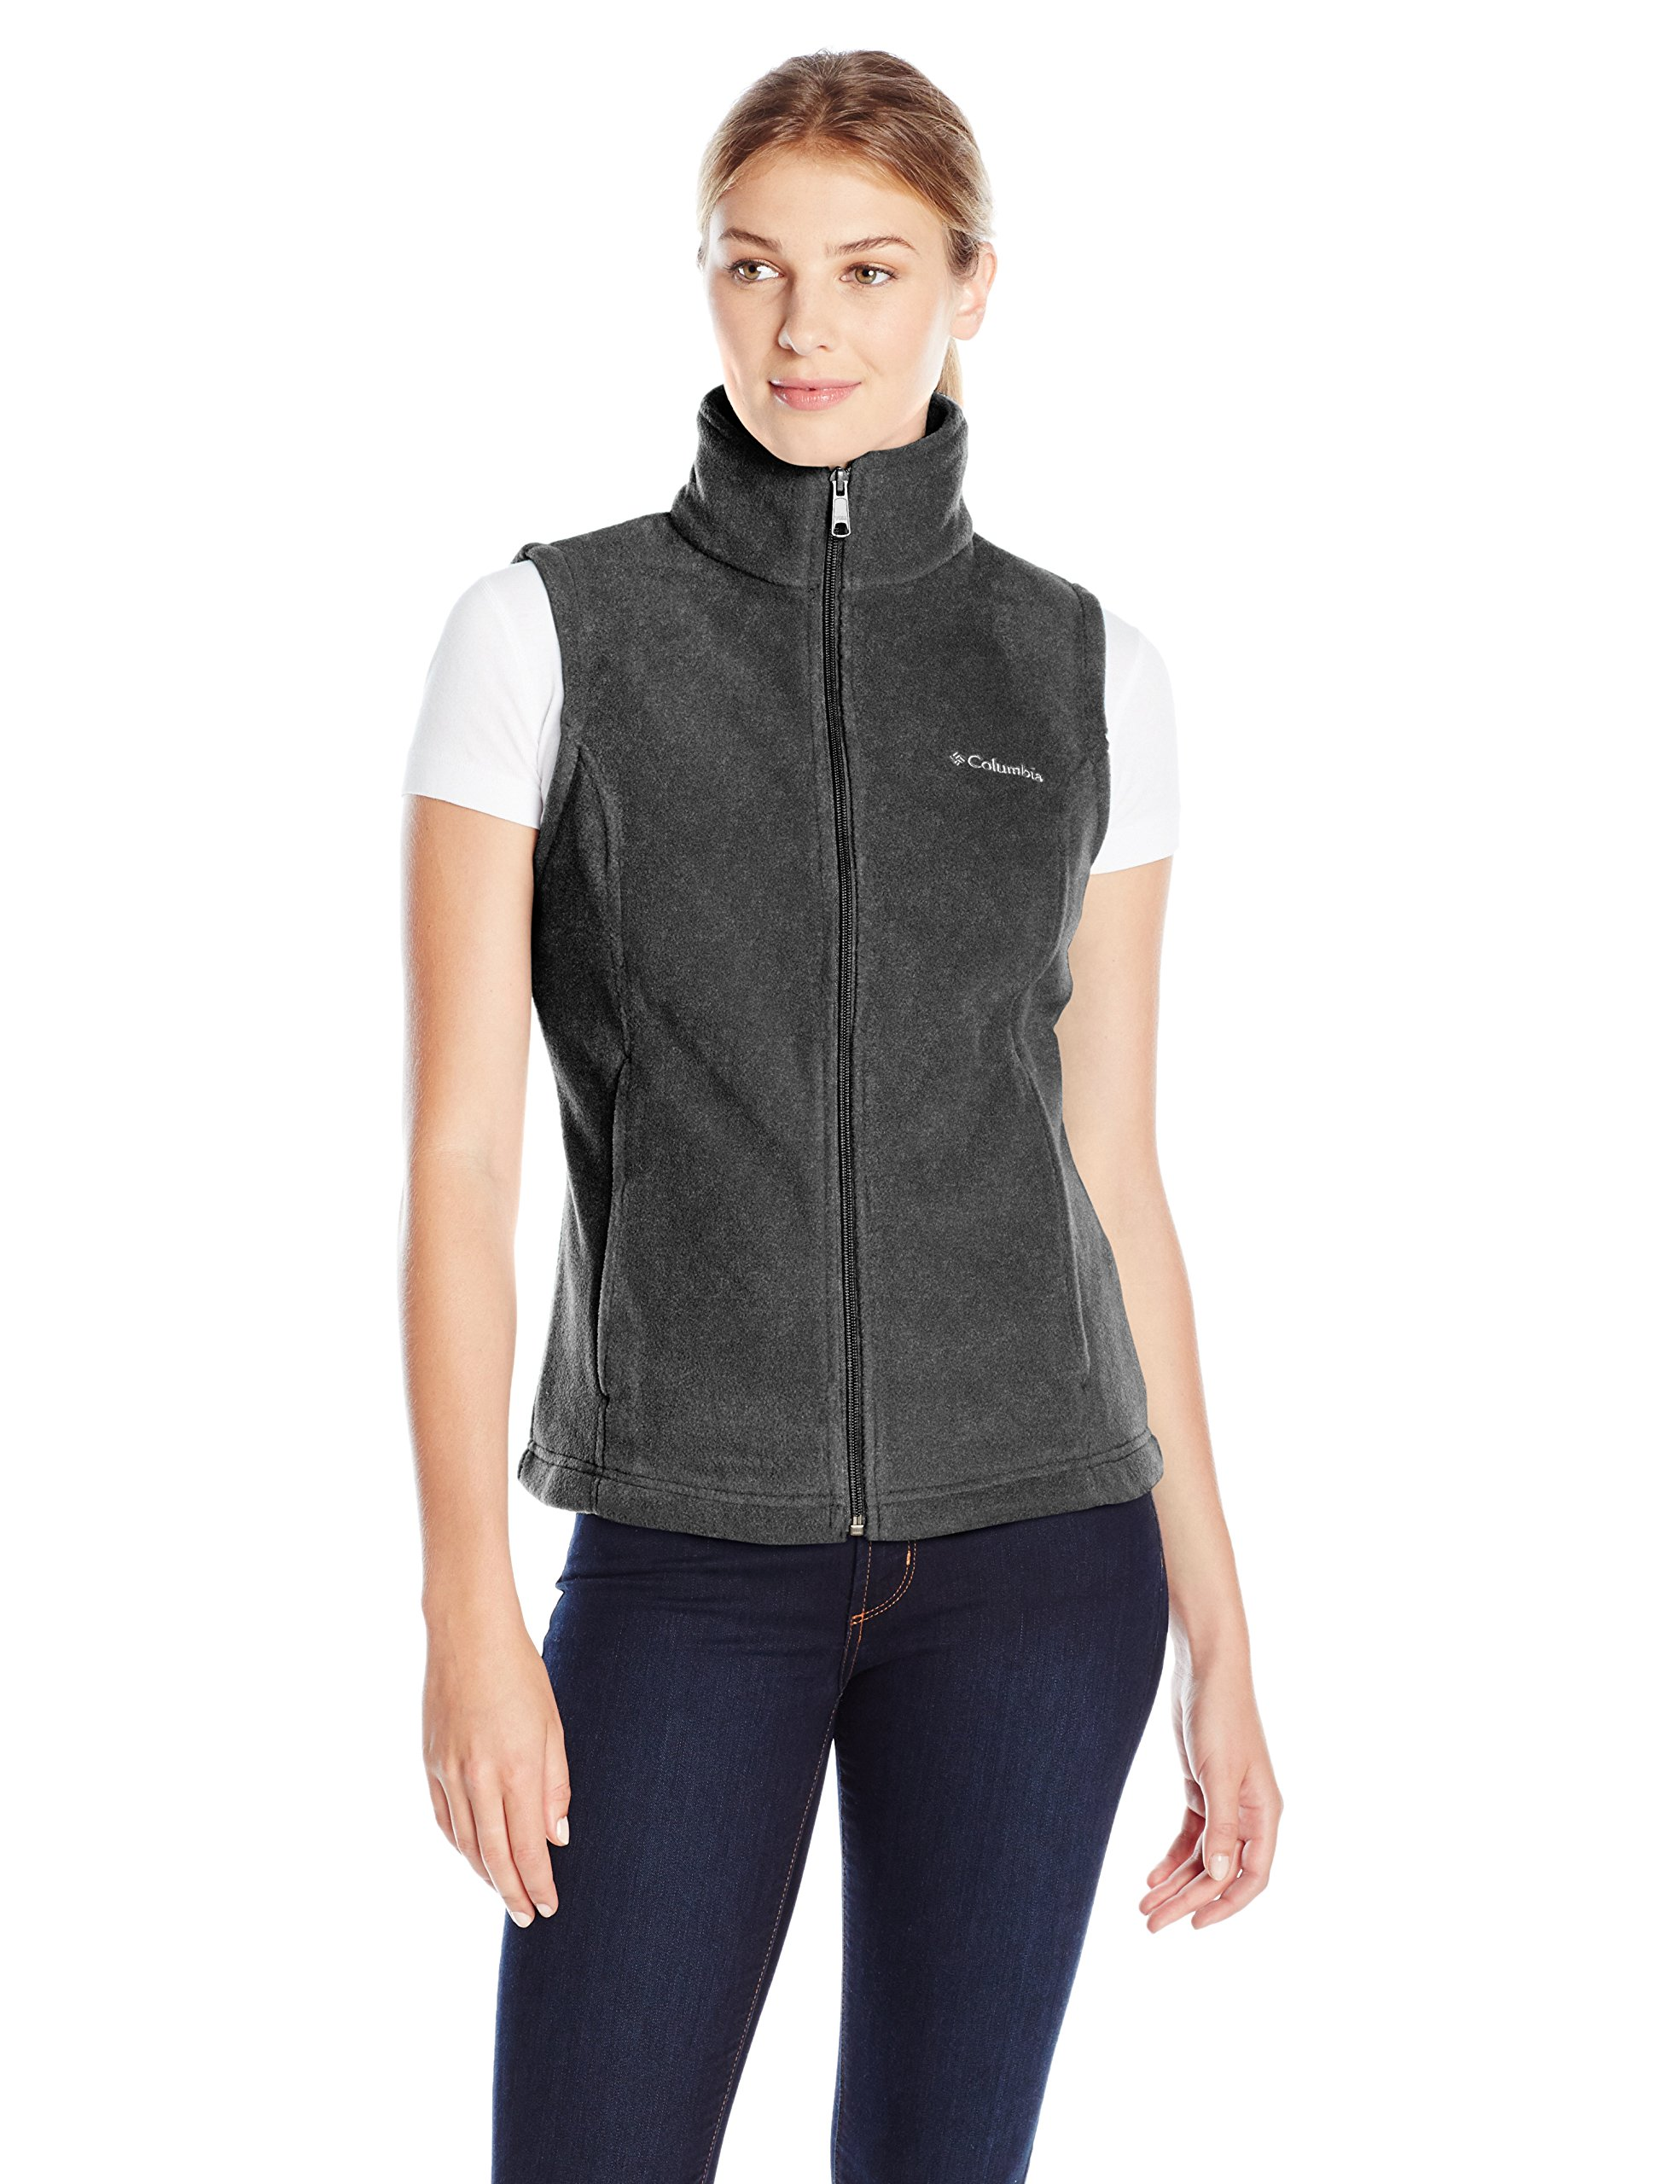 Columbia Women's Petite Benton Springs Vest - Petite Outerwear, Charcoal Heather, PM